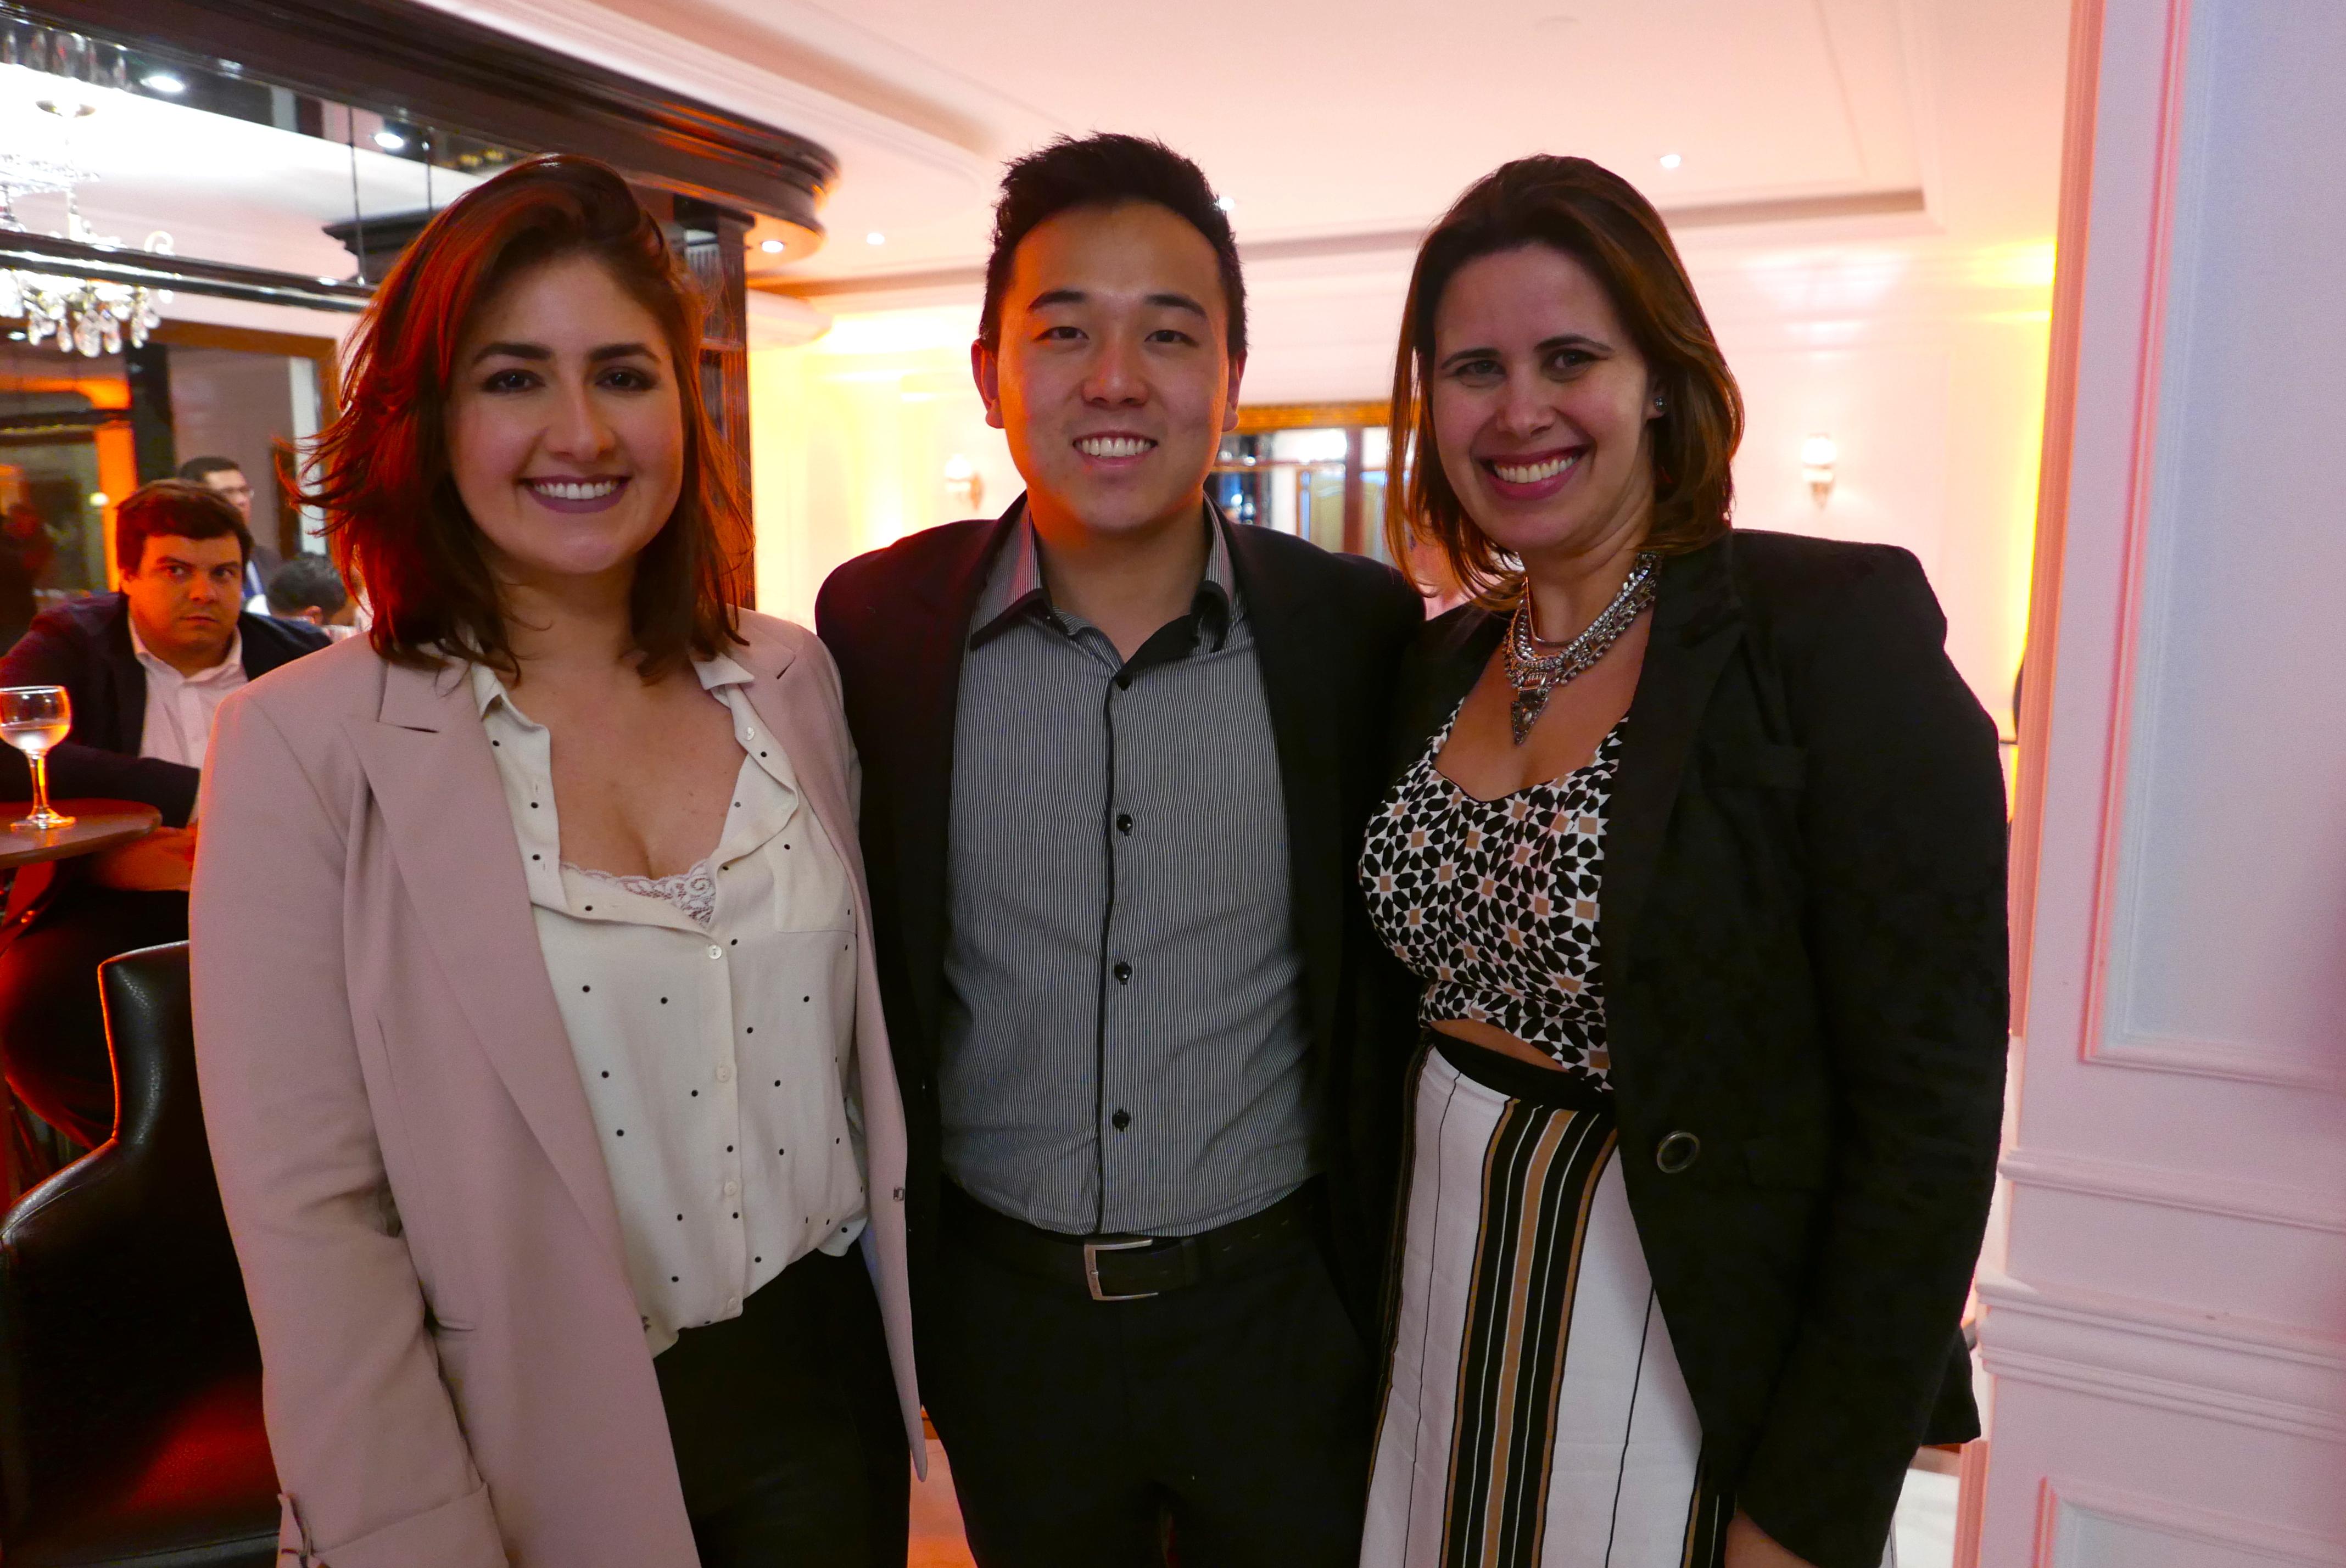 Ana Luiza Kunz, Luis Dyundi, e Cristiane Mors, da Laghetto Hotéis